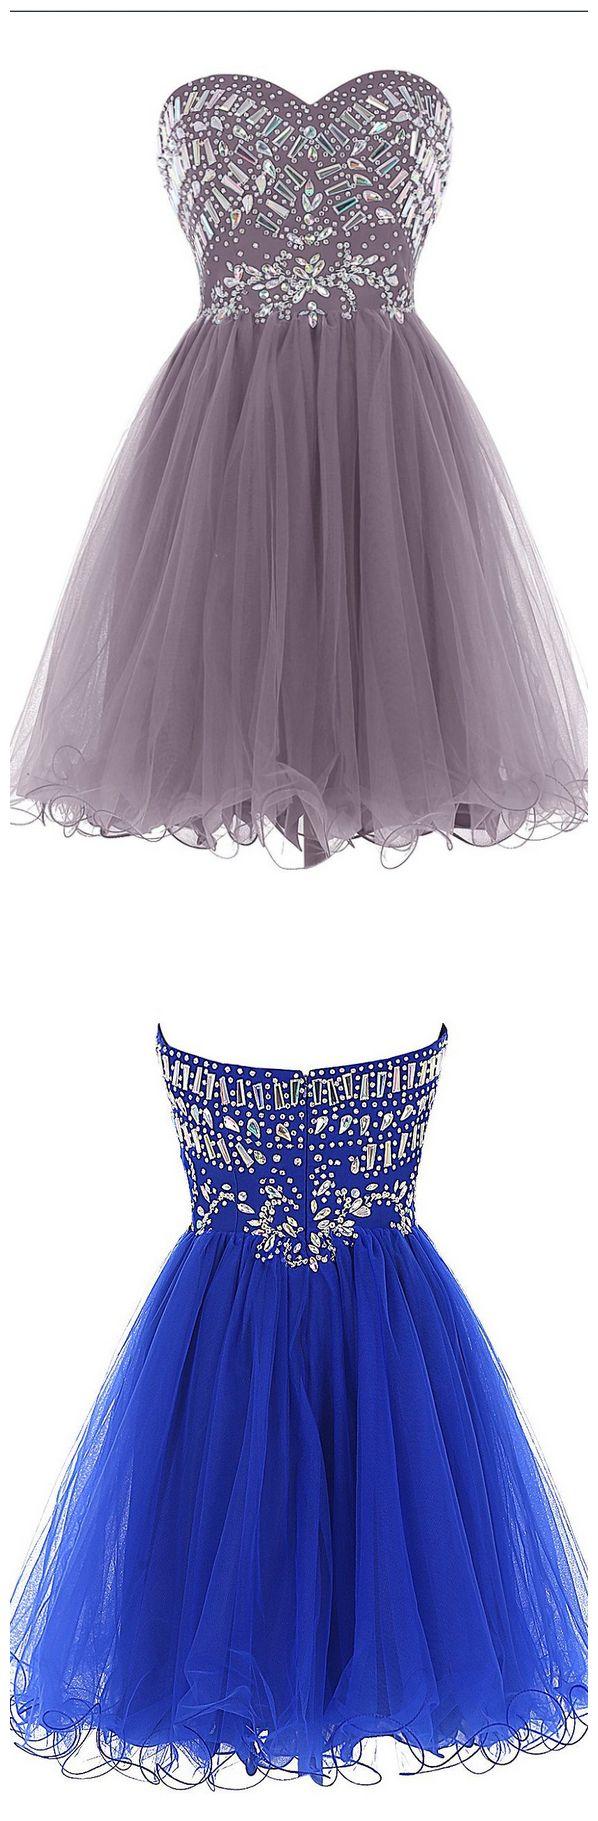 Short Beading Homecoming Dresses